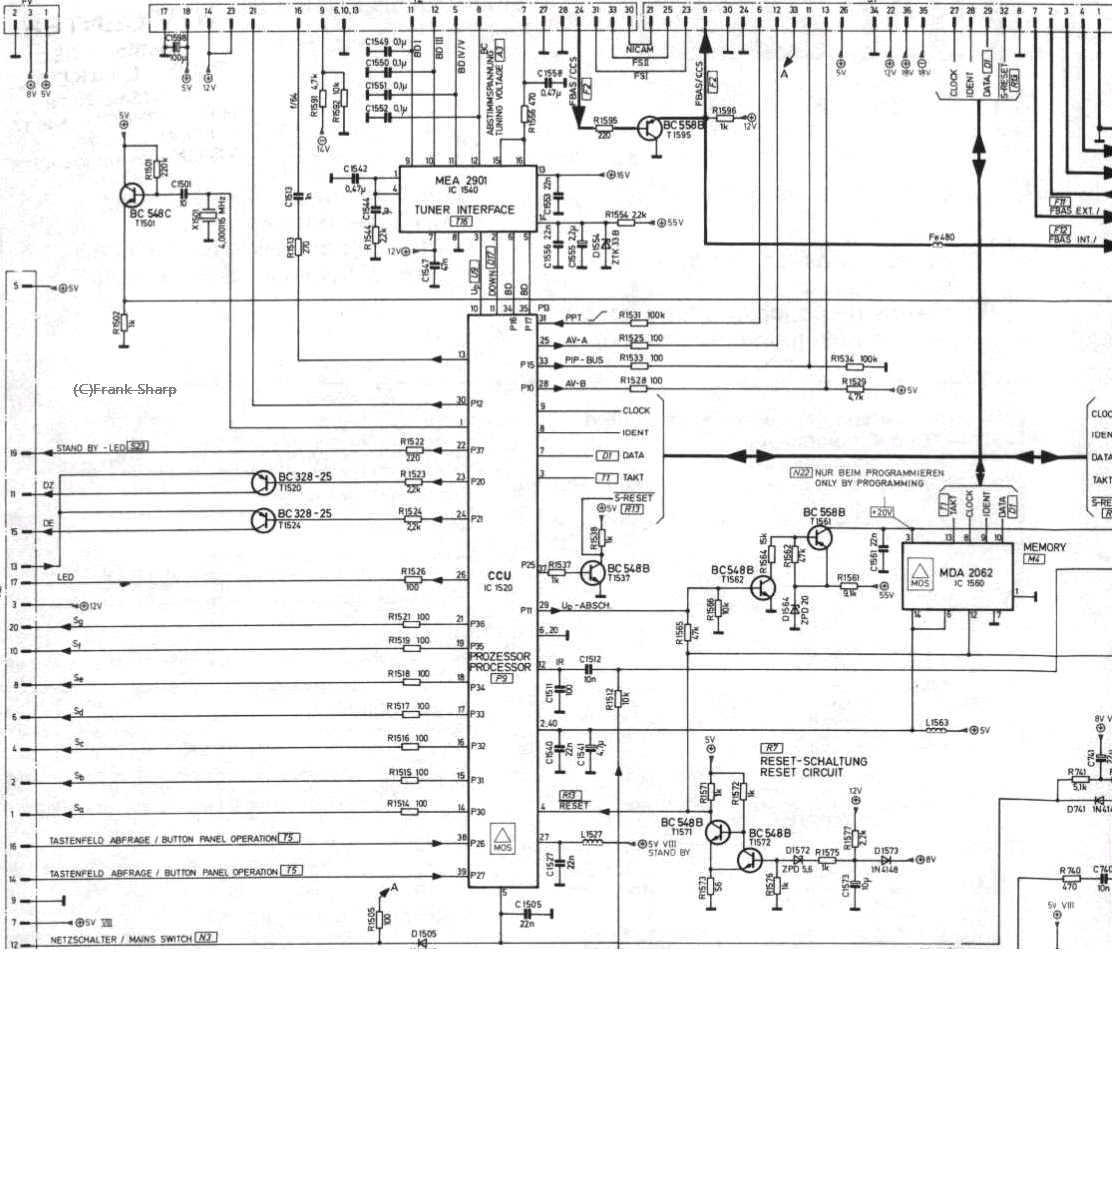 medium resolution of edenpure model 500 wiring diagram heat map diagram wiring edenpure heater model 1000 edenpure heater on sale